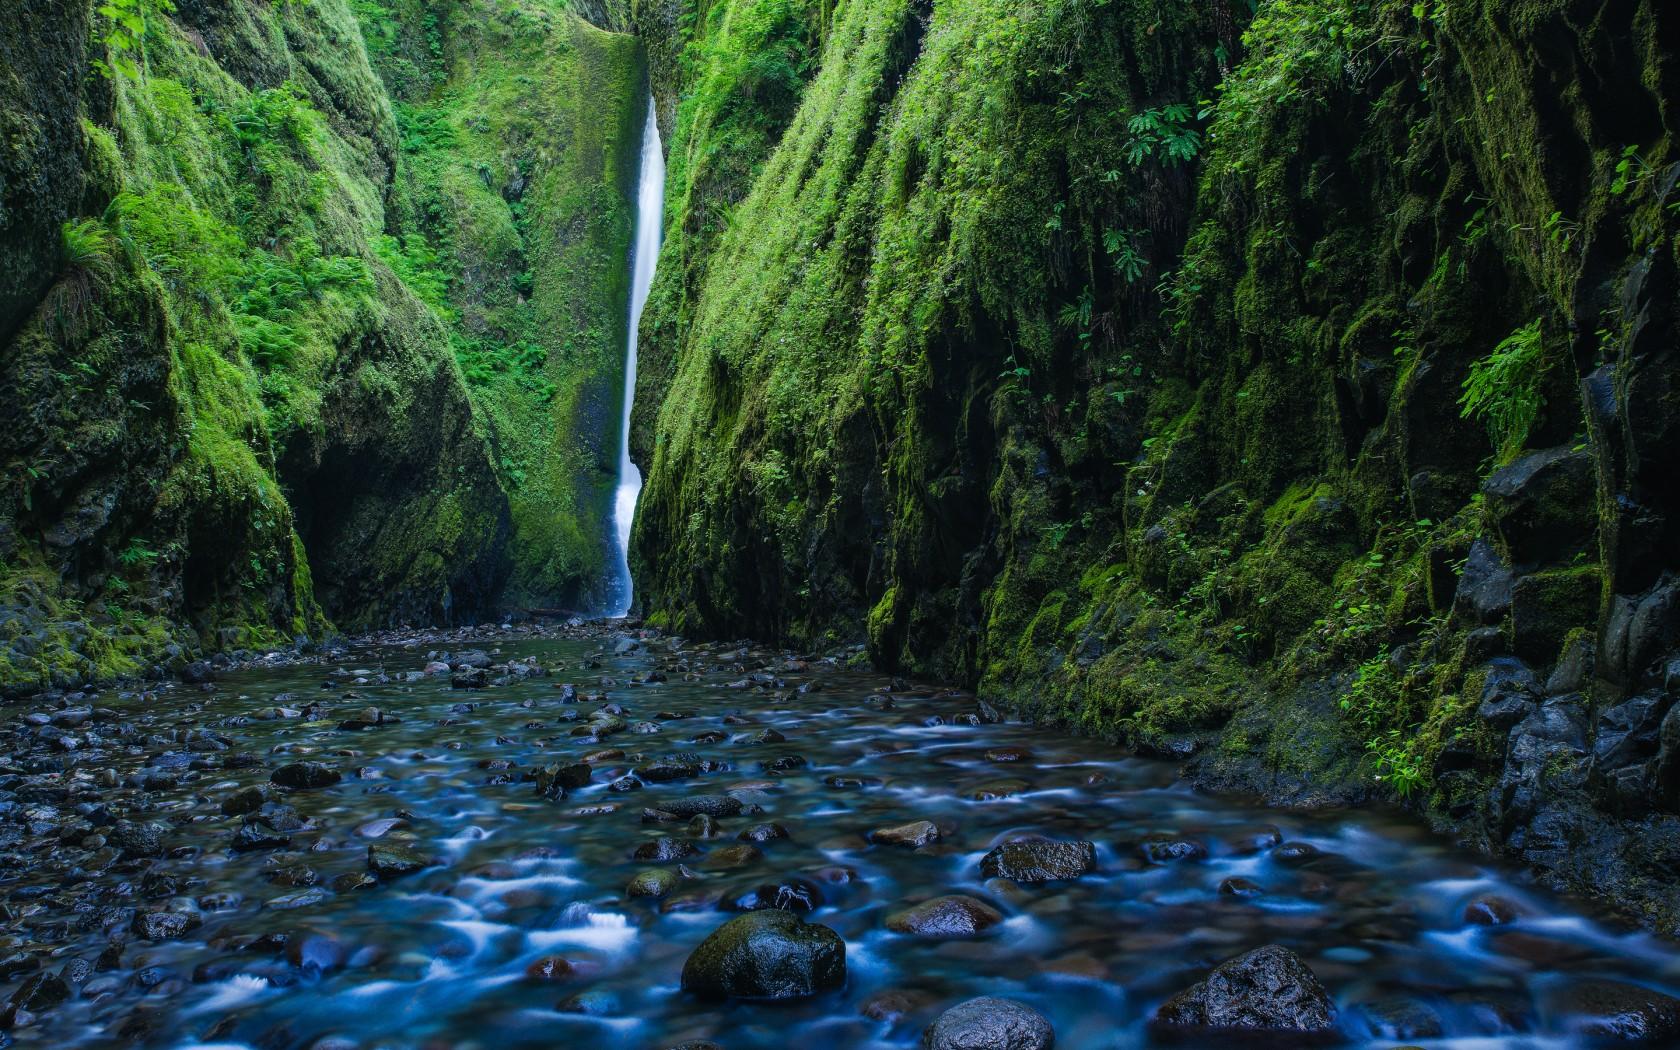 Portland Oregon Fall Had Wallpaper Oneonta Gorge Waterfall Oregon Wallpapers Hd Wallpapers